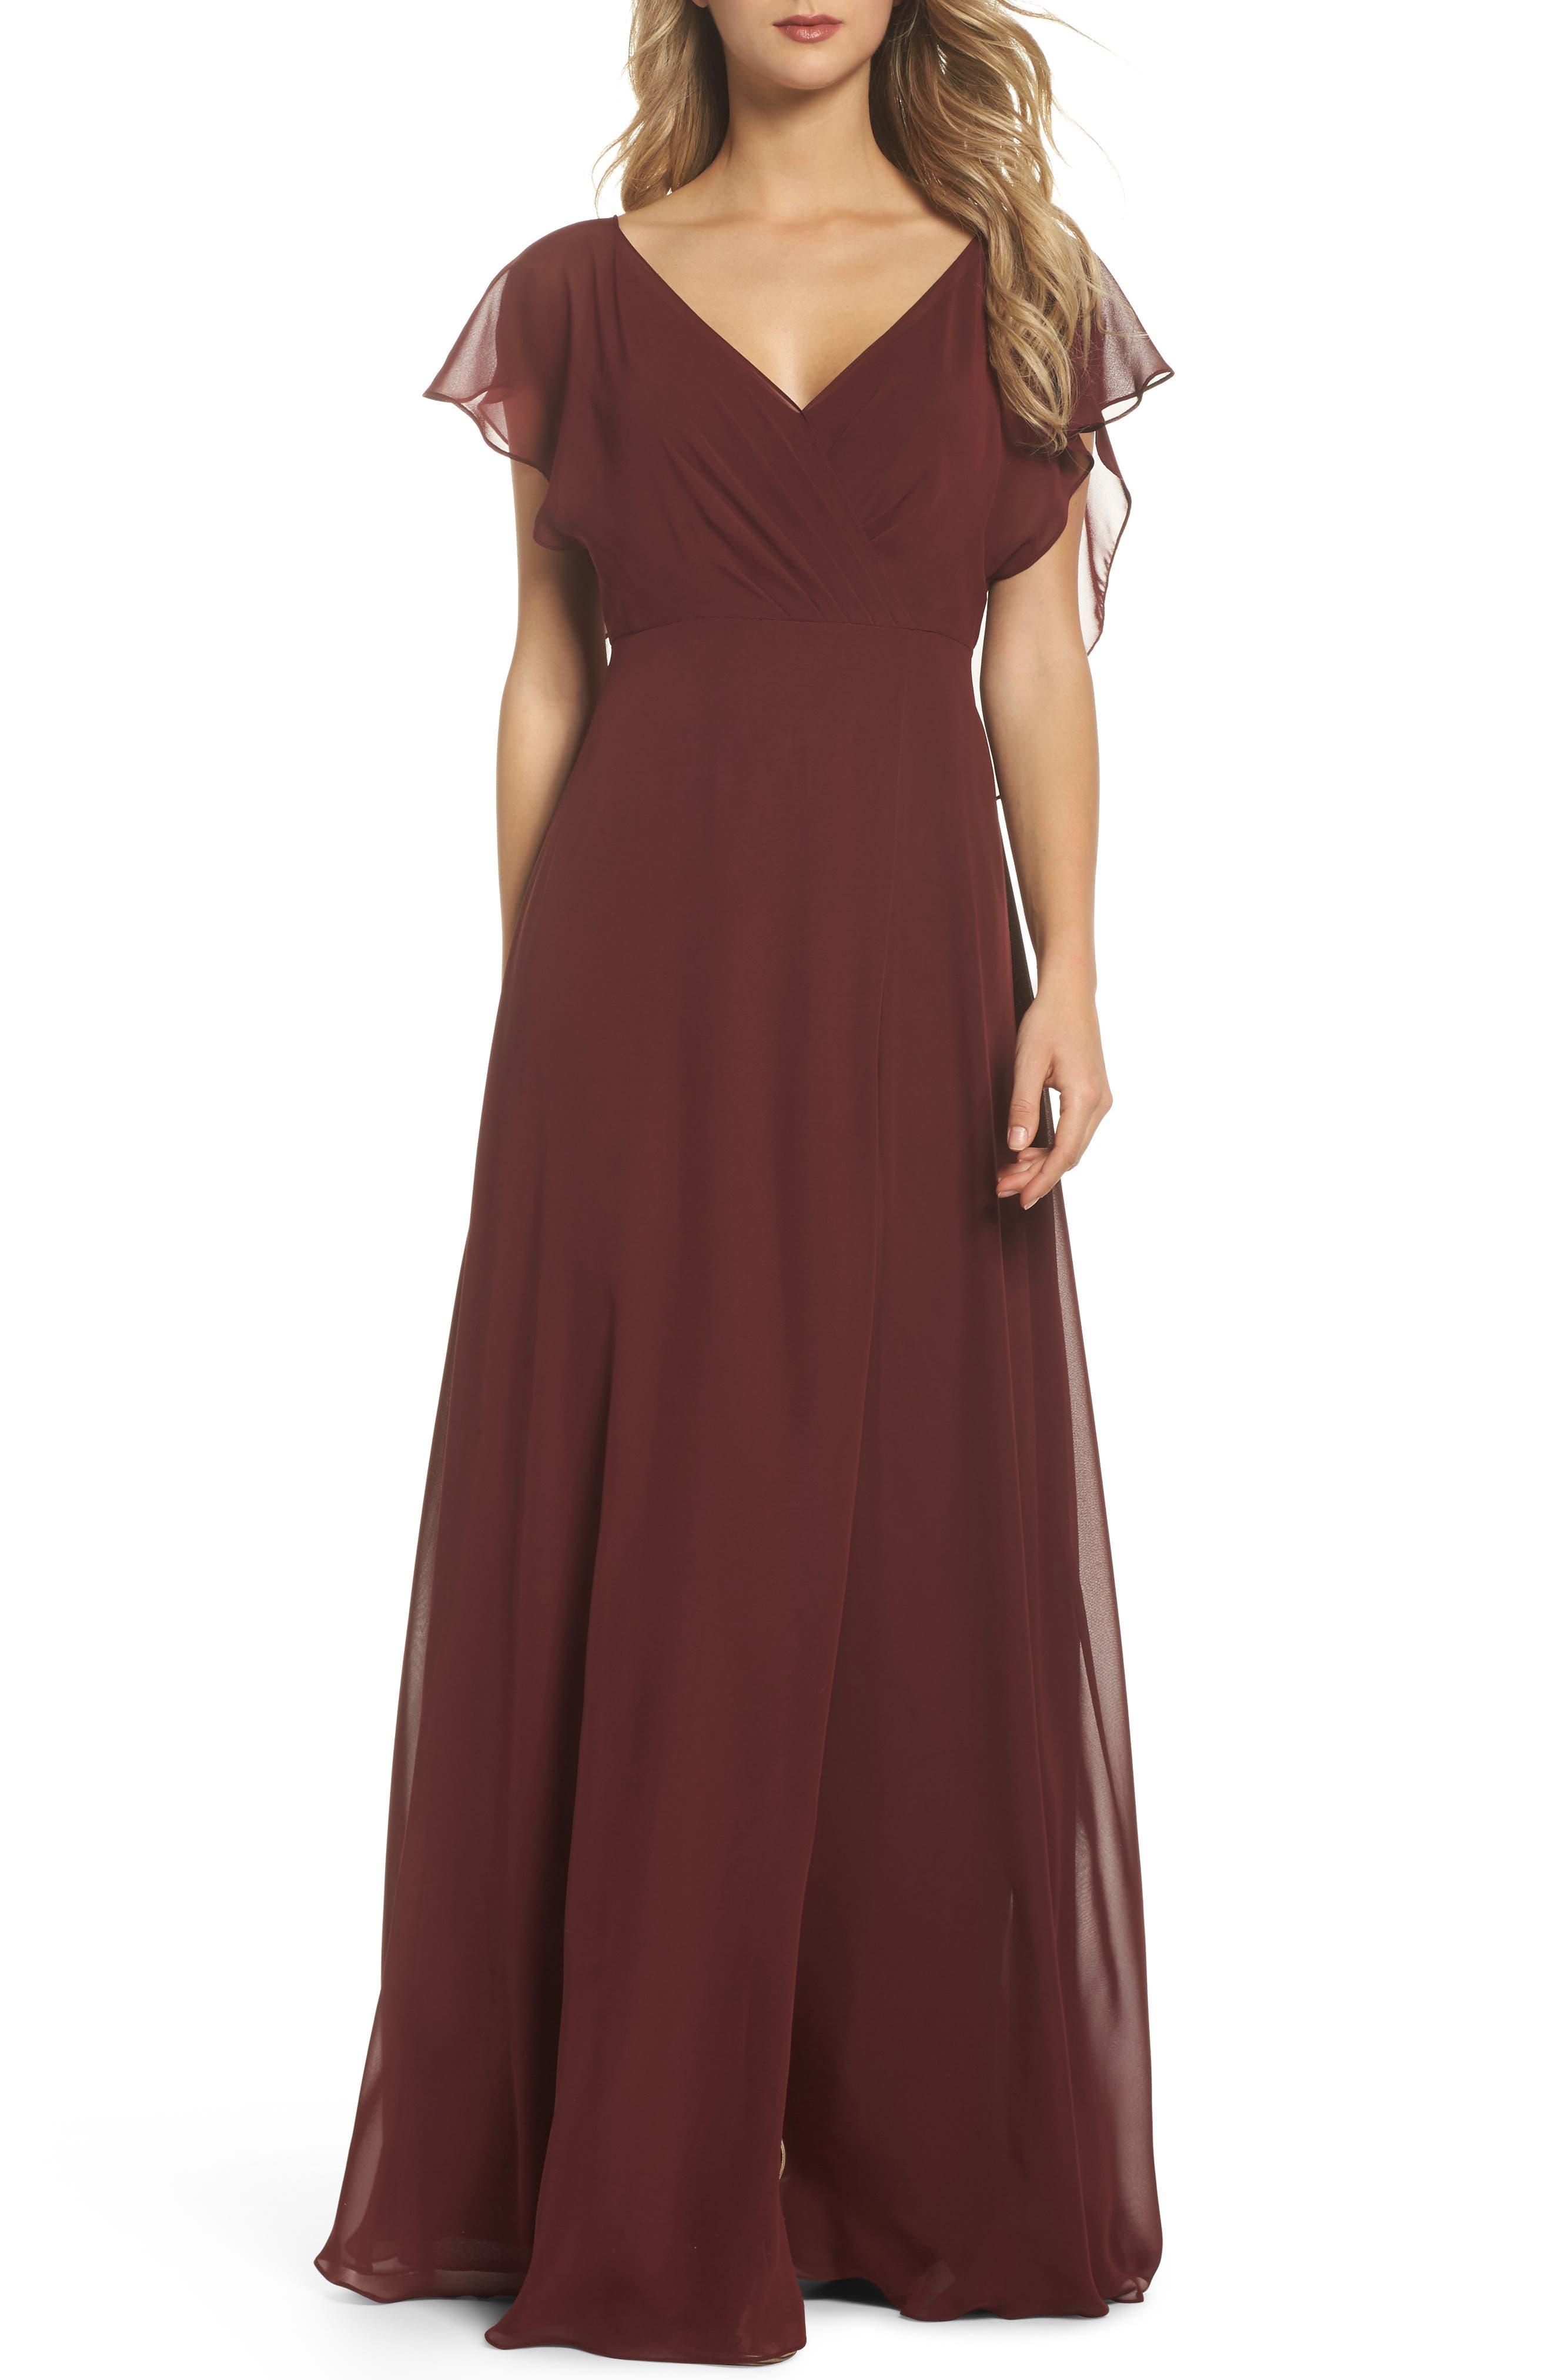 JENNY YOO Alanna Open Back Chiffon Gown, Main, color, 932